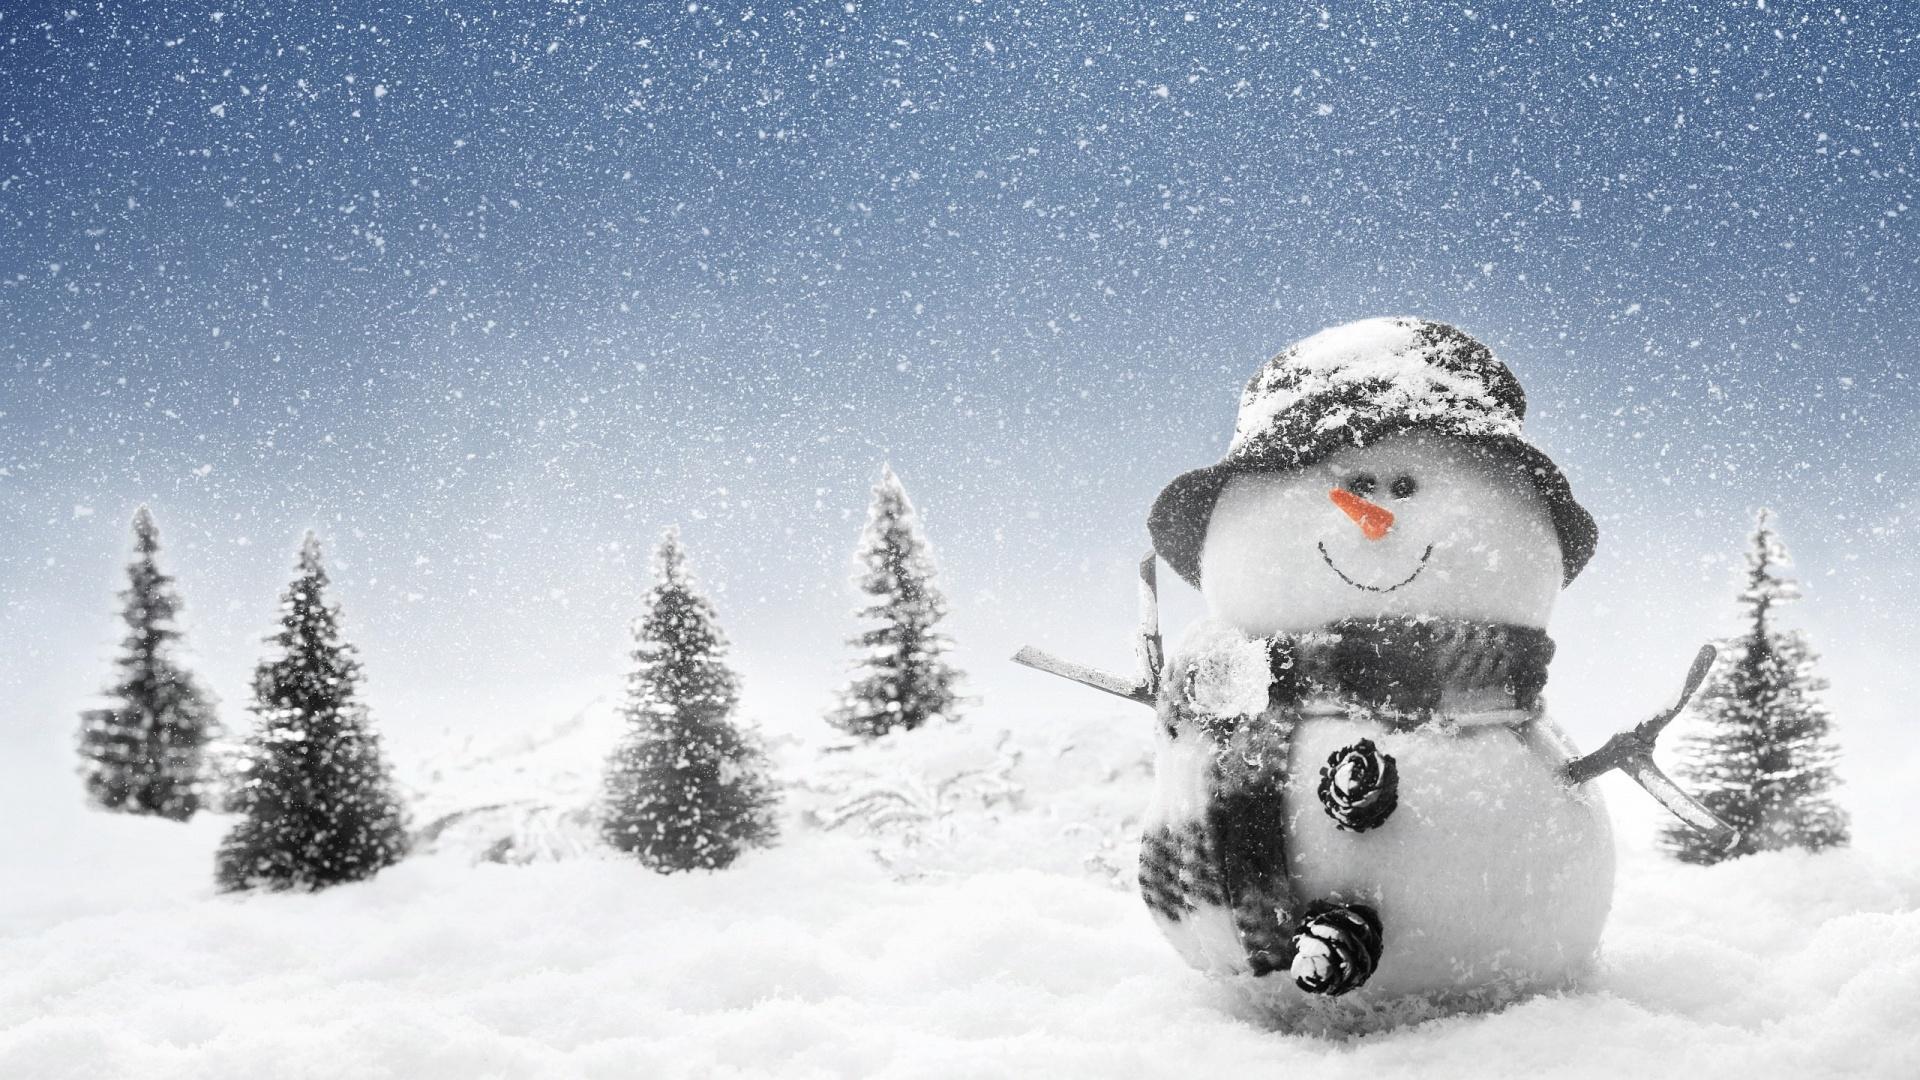 Winter Snowman Mystery Wallpaper